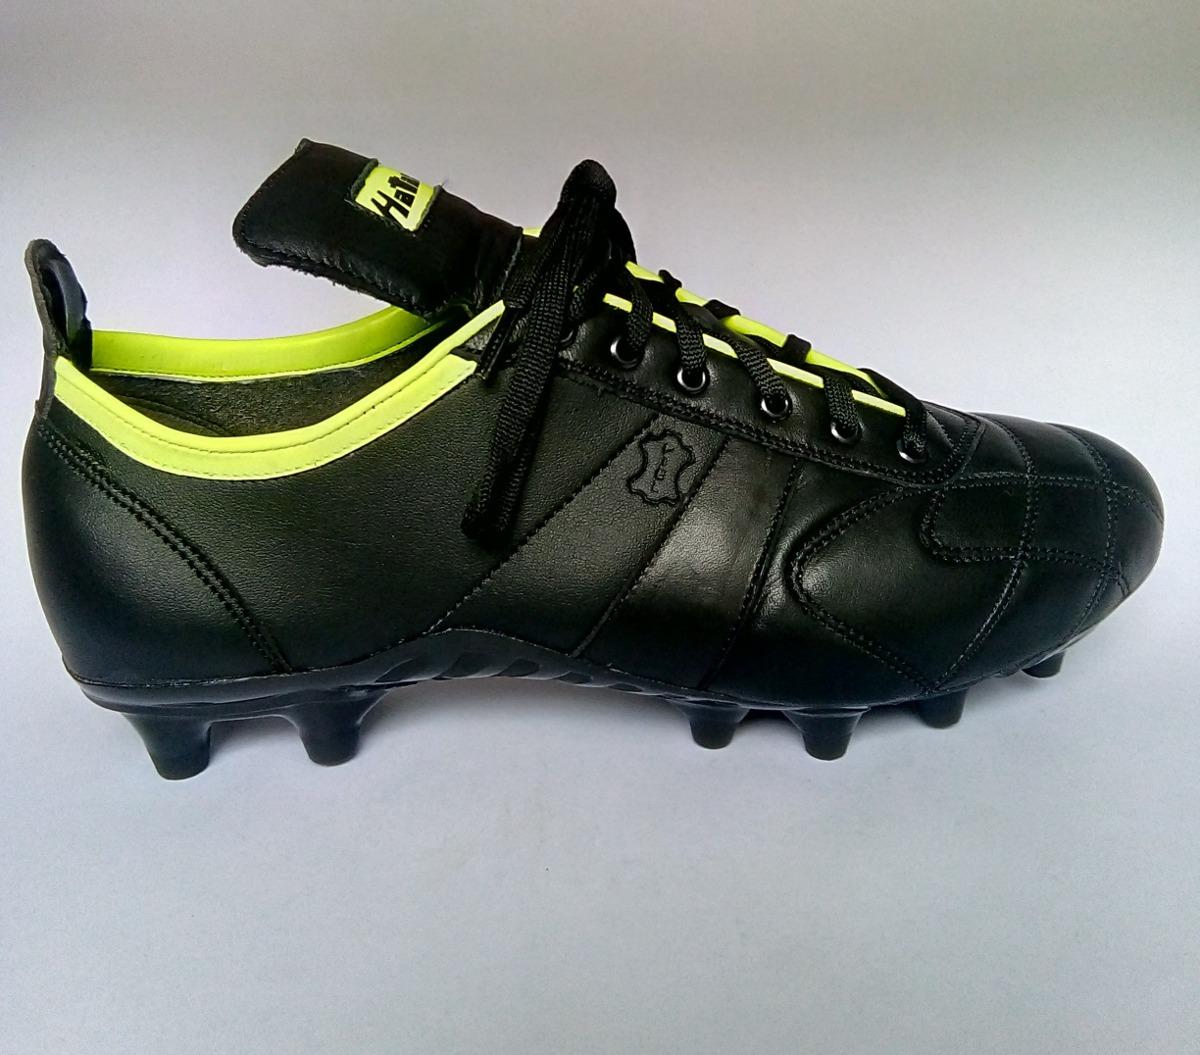 01d70b5e9c95f zapato de futbol estilo colmenero. Cargando zoom.